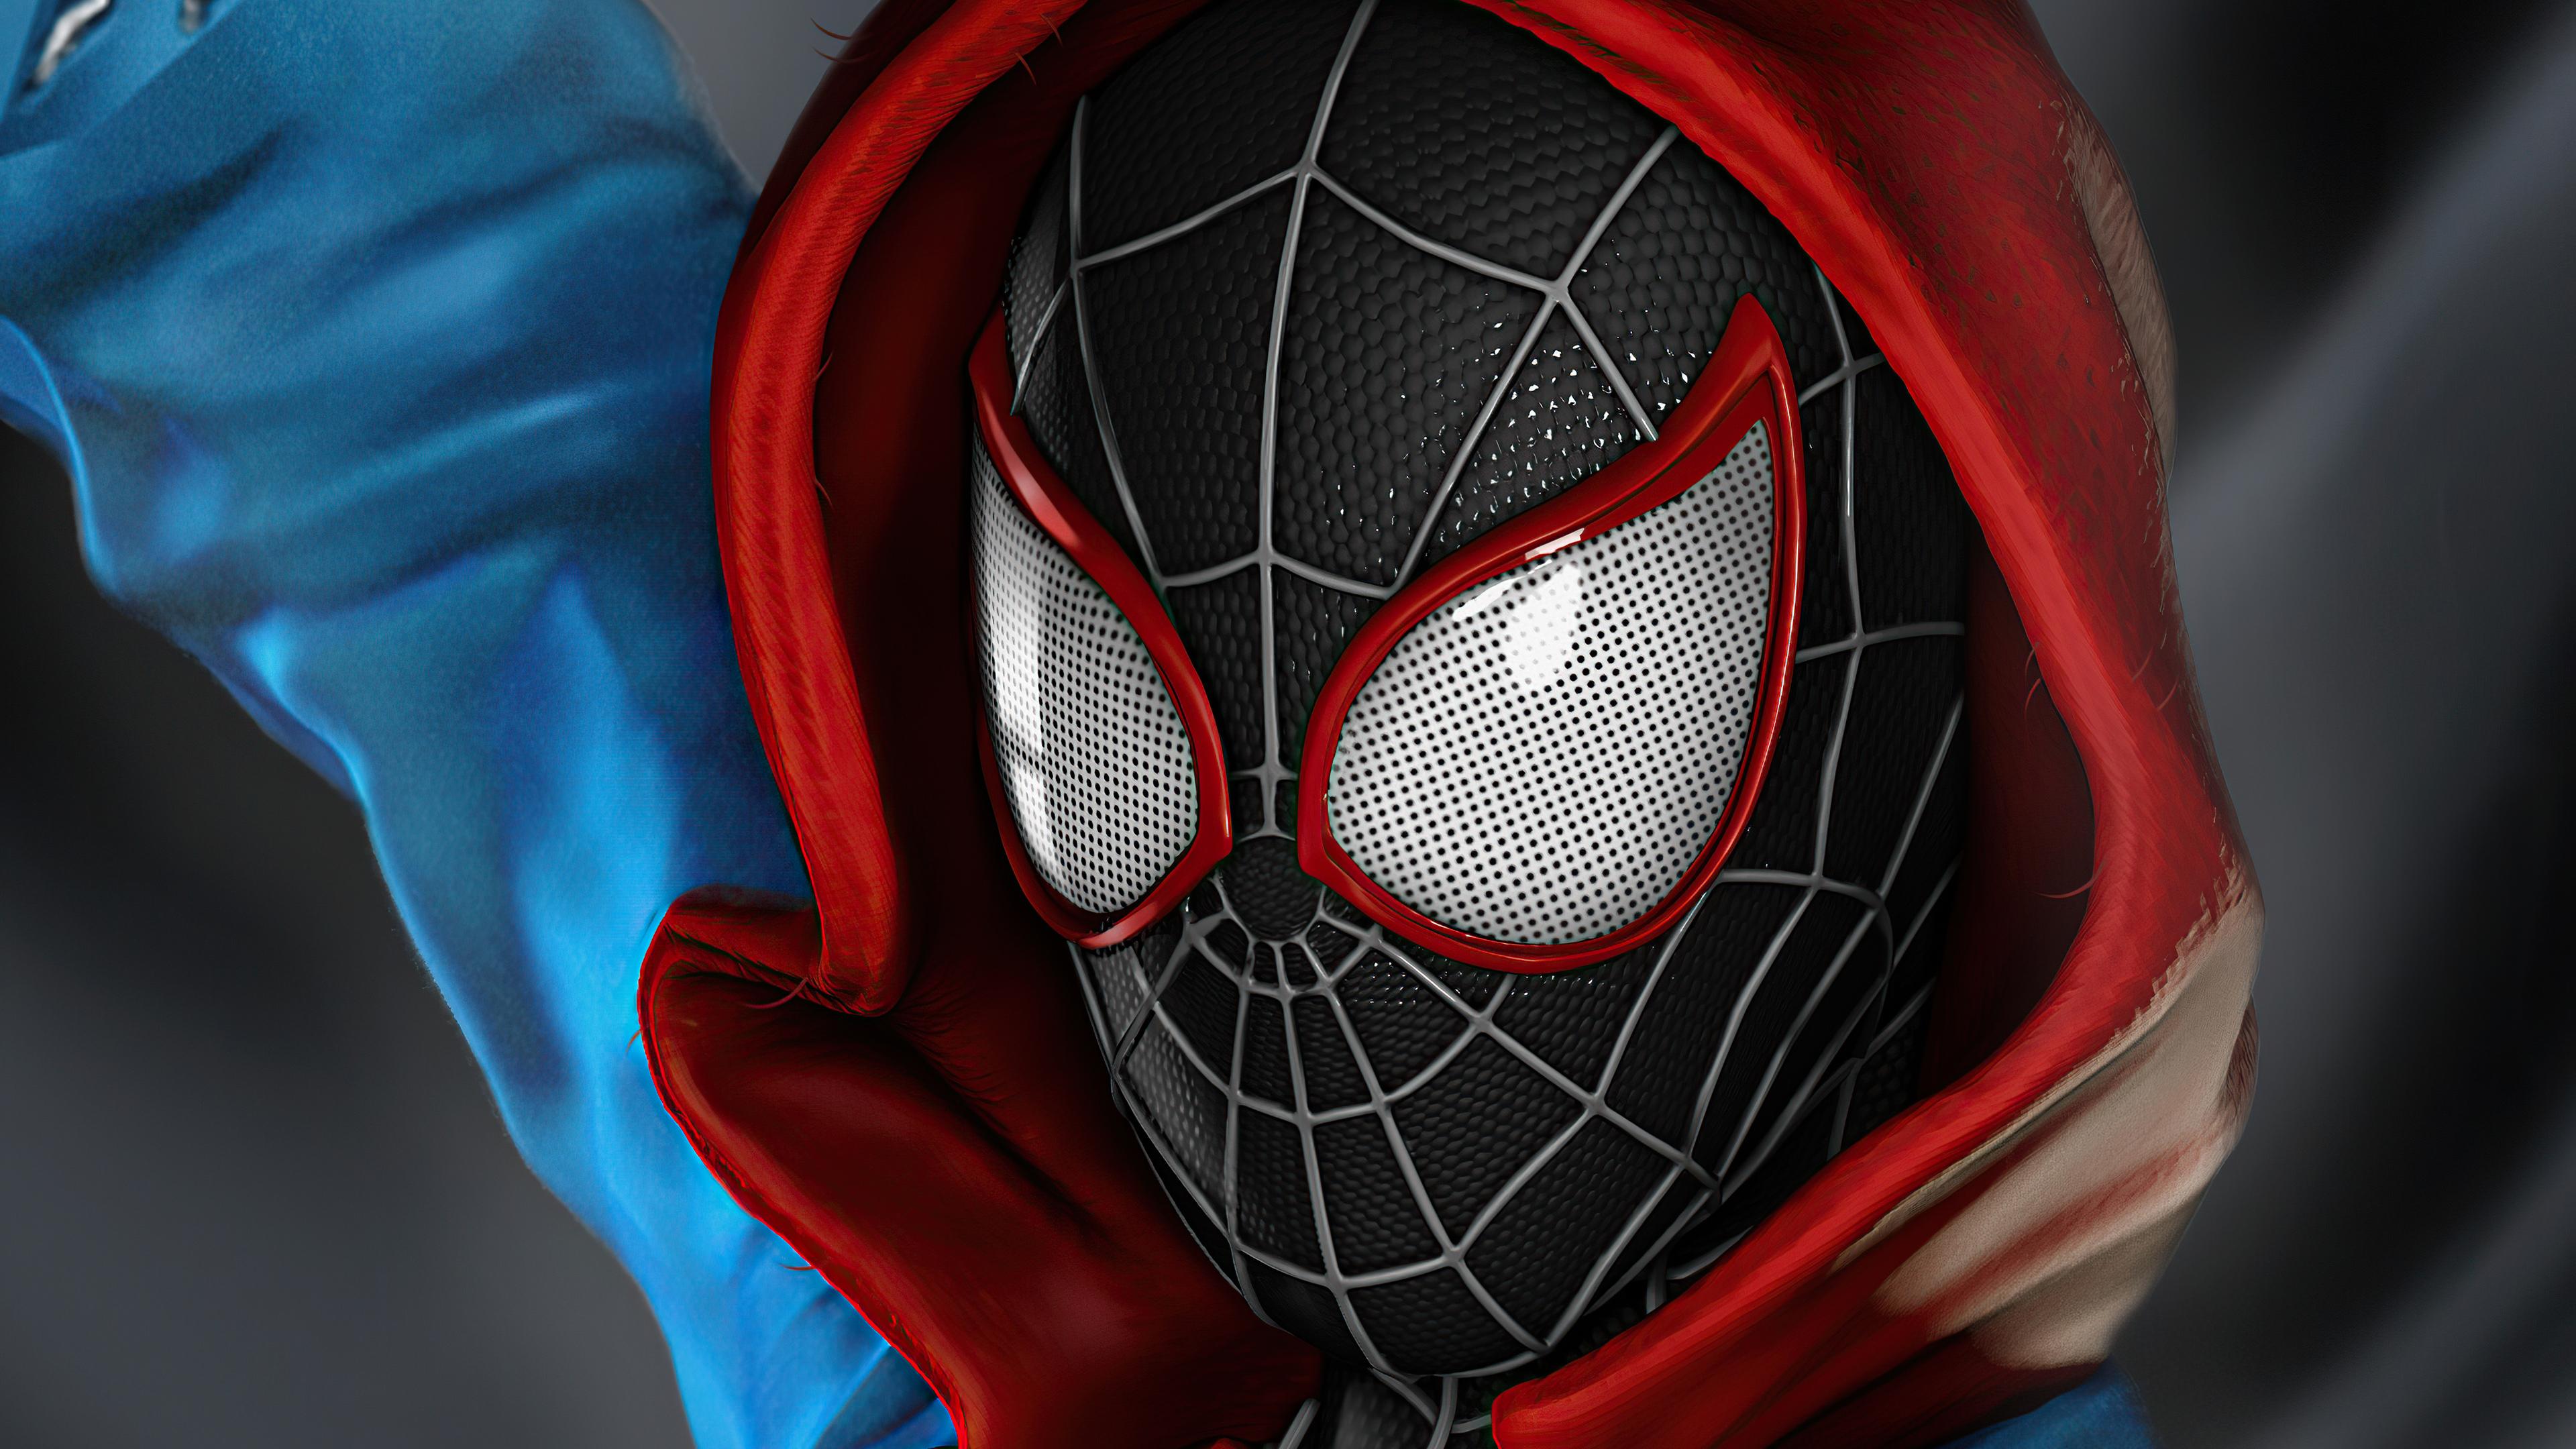 spider man miles morales costume 4k 1616957339 - Spider Man Miles Morales Costume 4k - Spider Man Miles Morales Costume 4k wallpapers